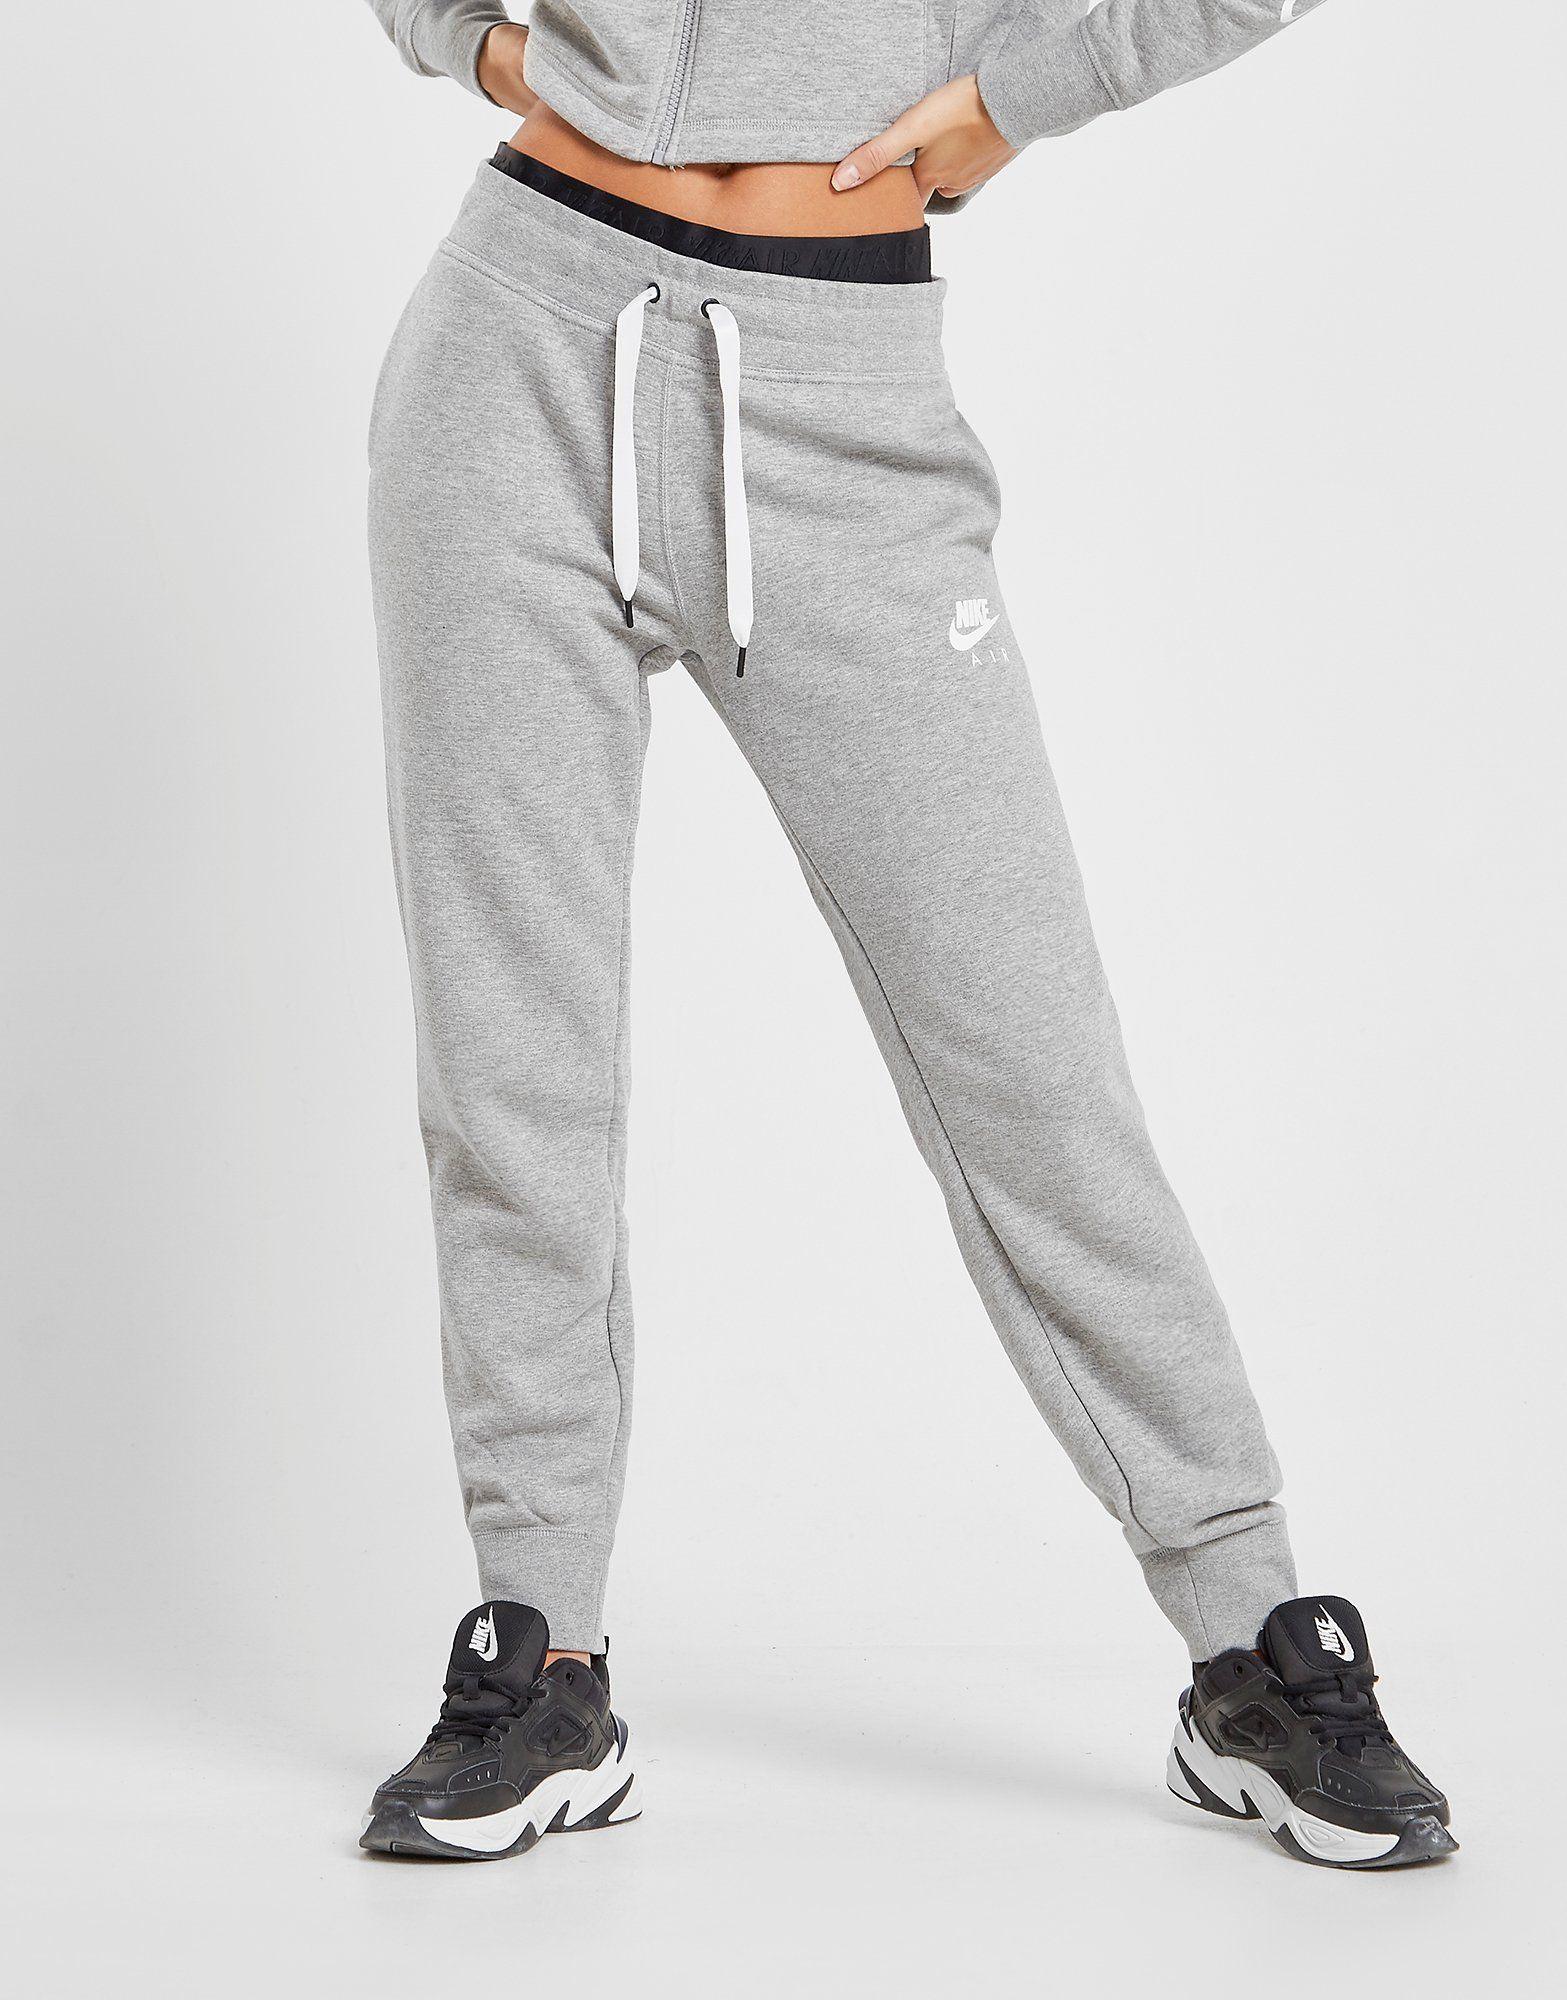 NIKE Nike Air Women's Fleece Trousers